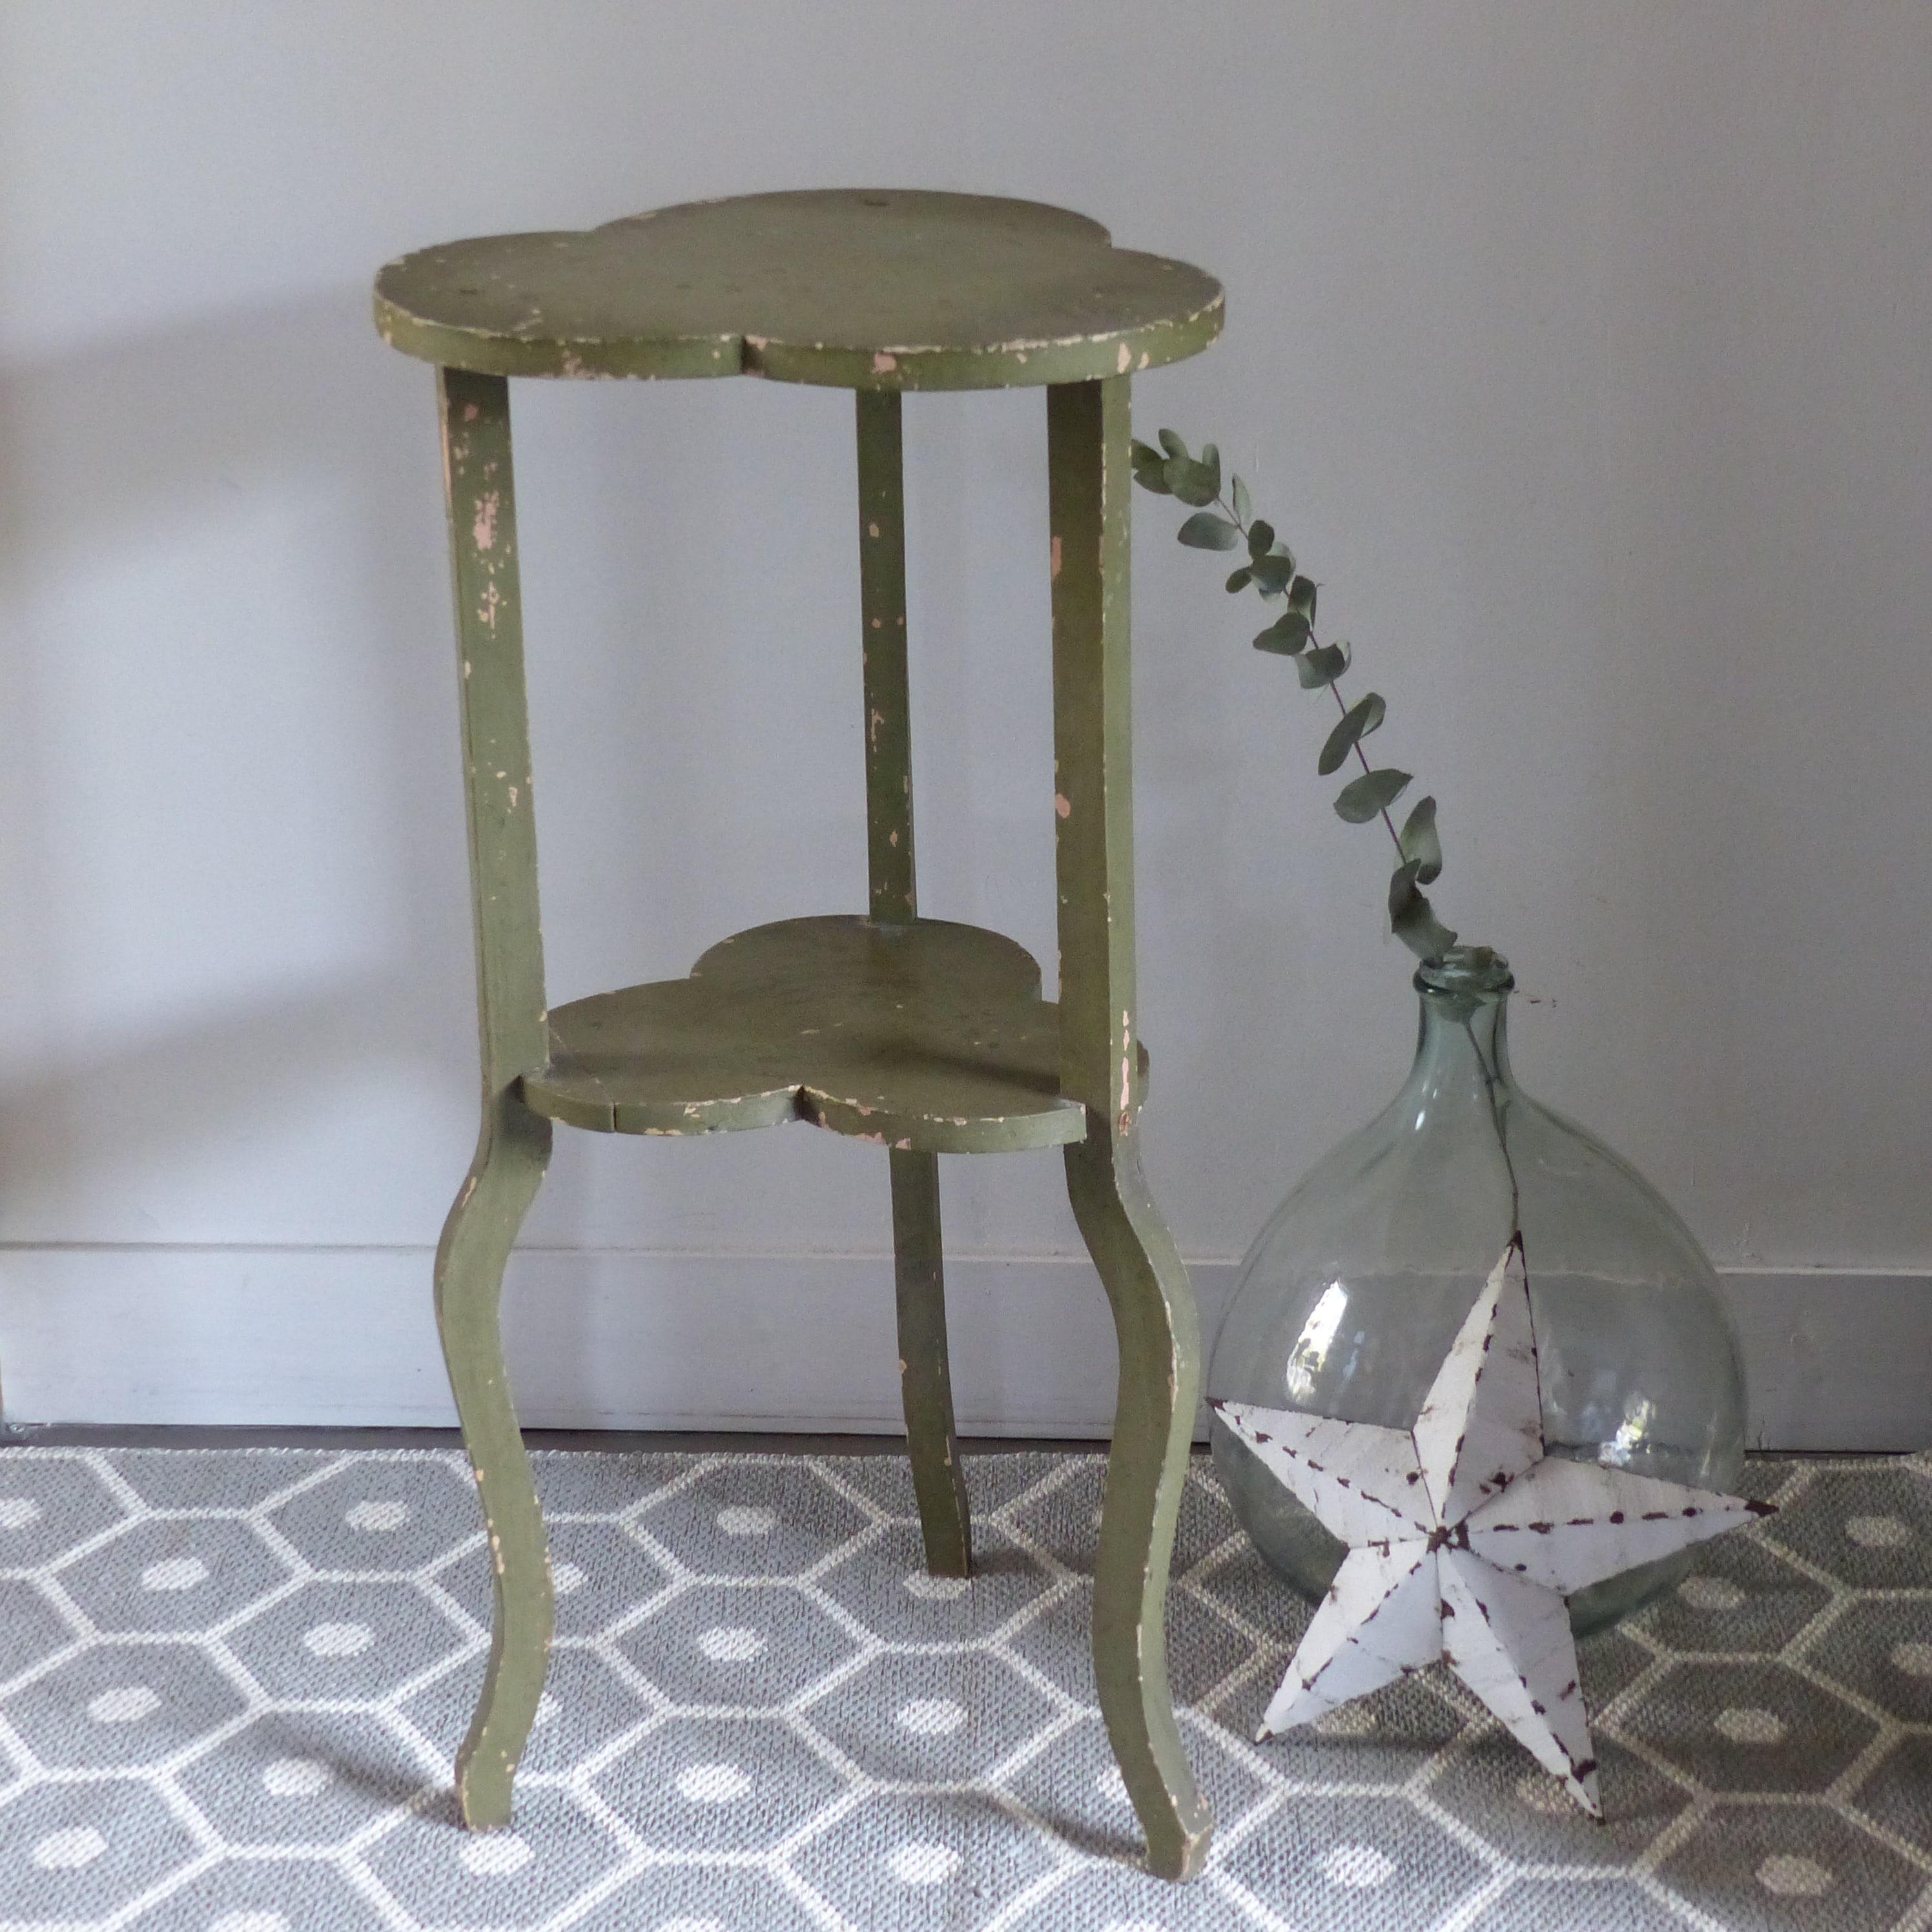 sellette tr fle en bois tripode lignedebrocante brocante en ligne chine pour vous meubles. Black Bedroom Furniture Sets. Home Design Ideas